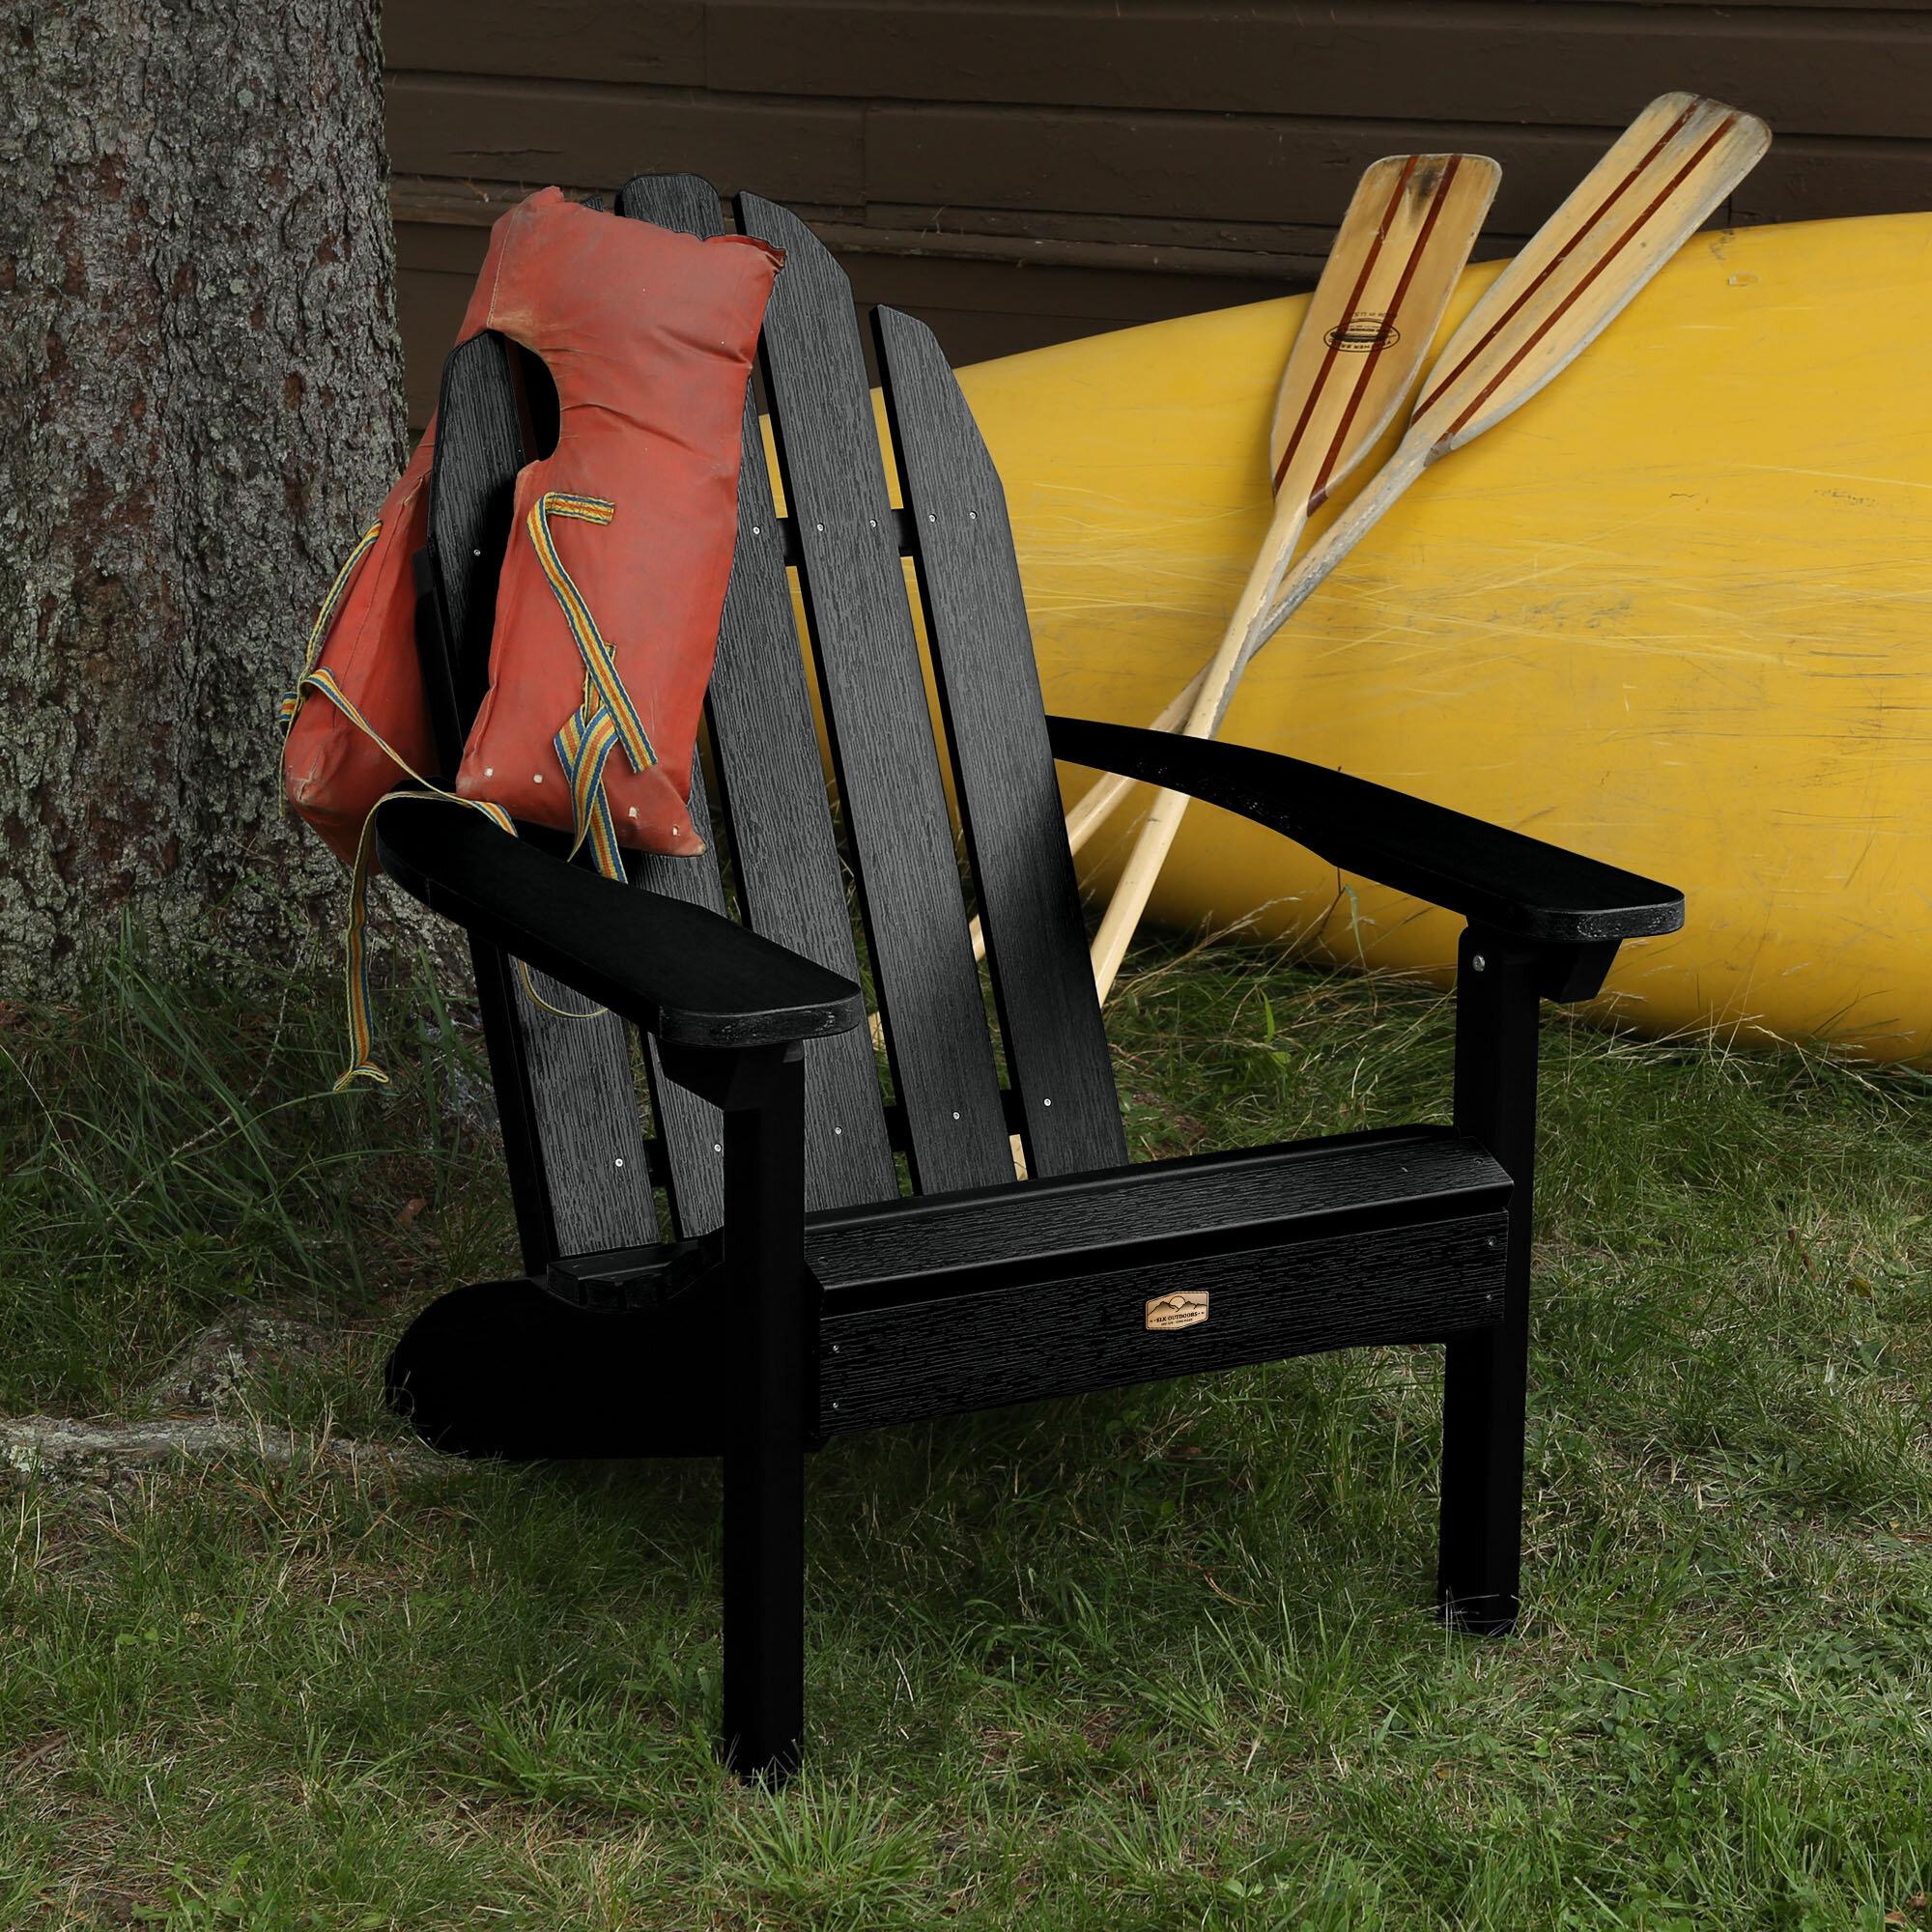 Beachcrest Home Hamptonburgh Essential Plastic Adirondack Chair Reviews Wayfair